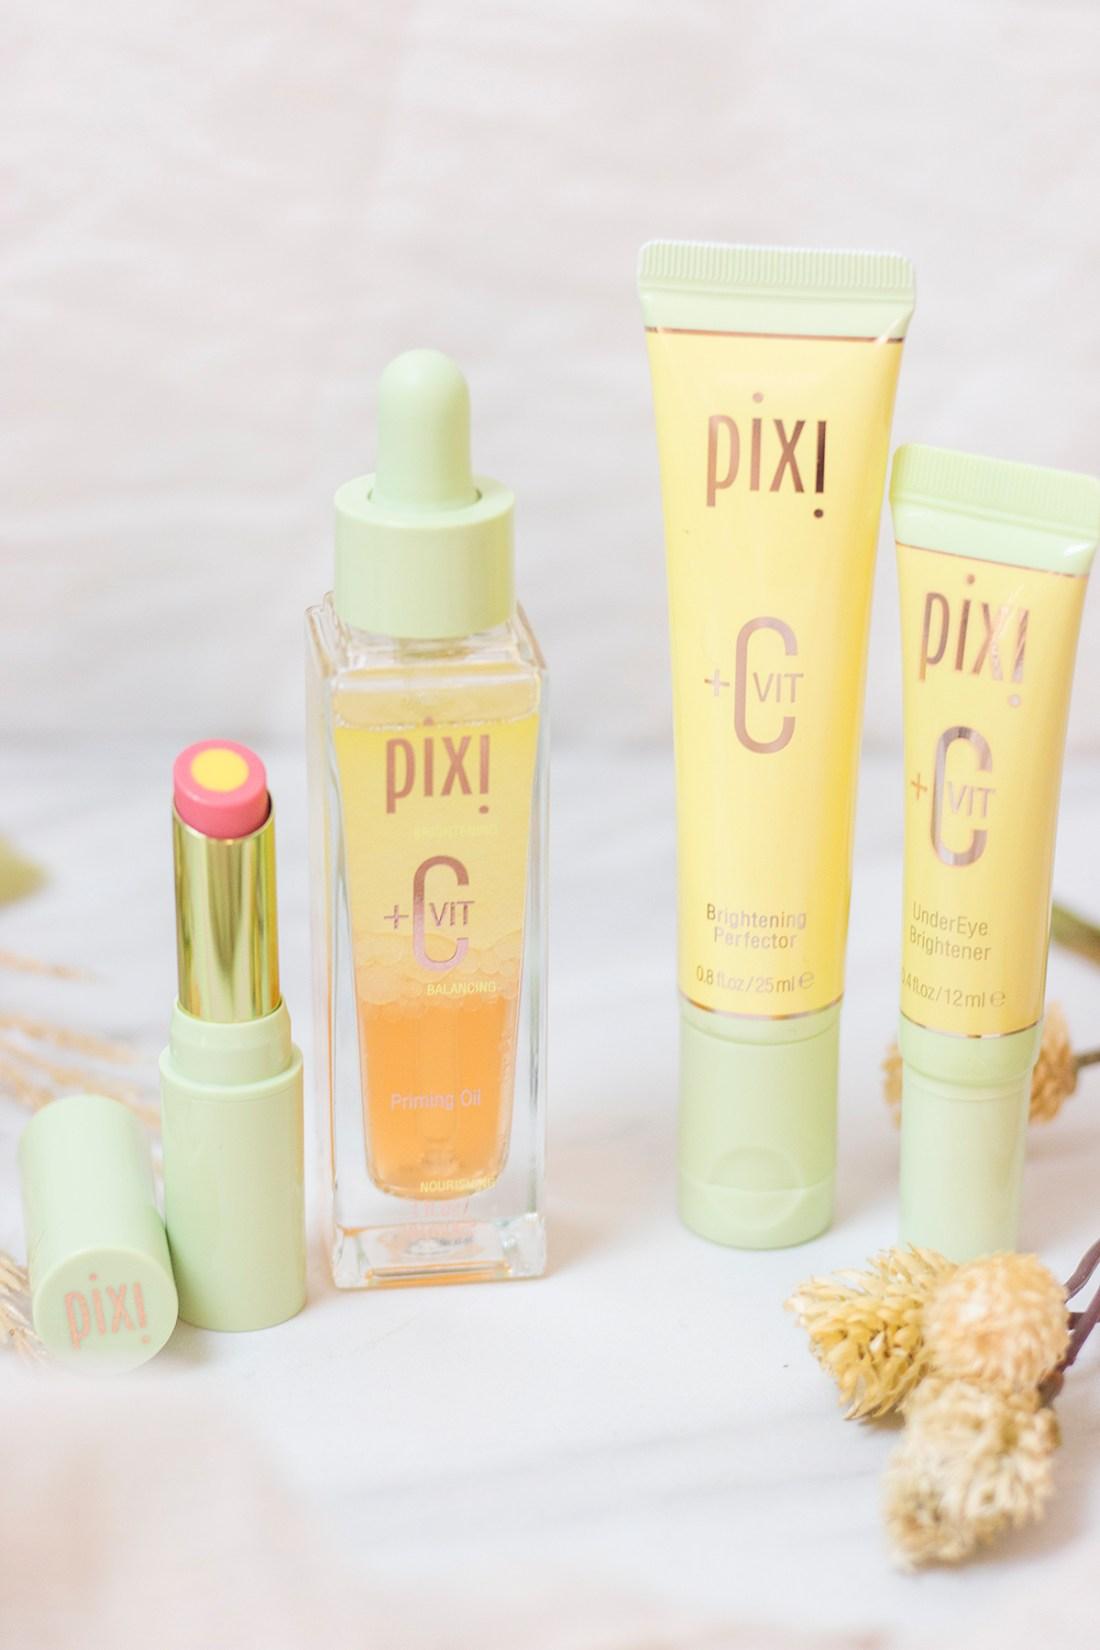 Pixi Beauty +C VIT Collection Review | A Good Hue Blog